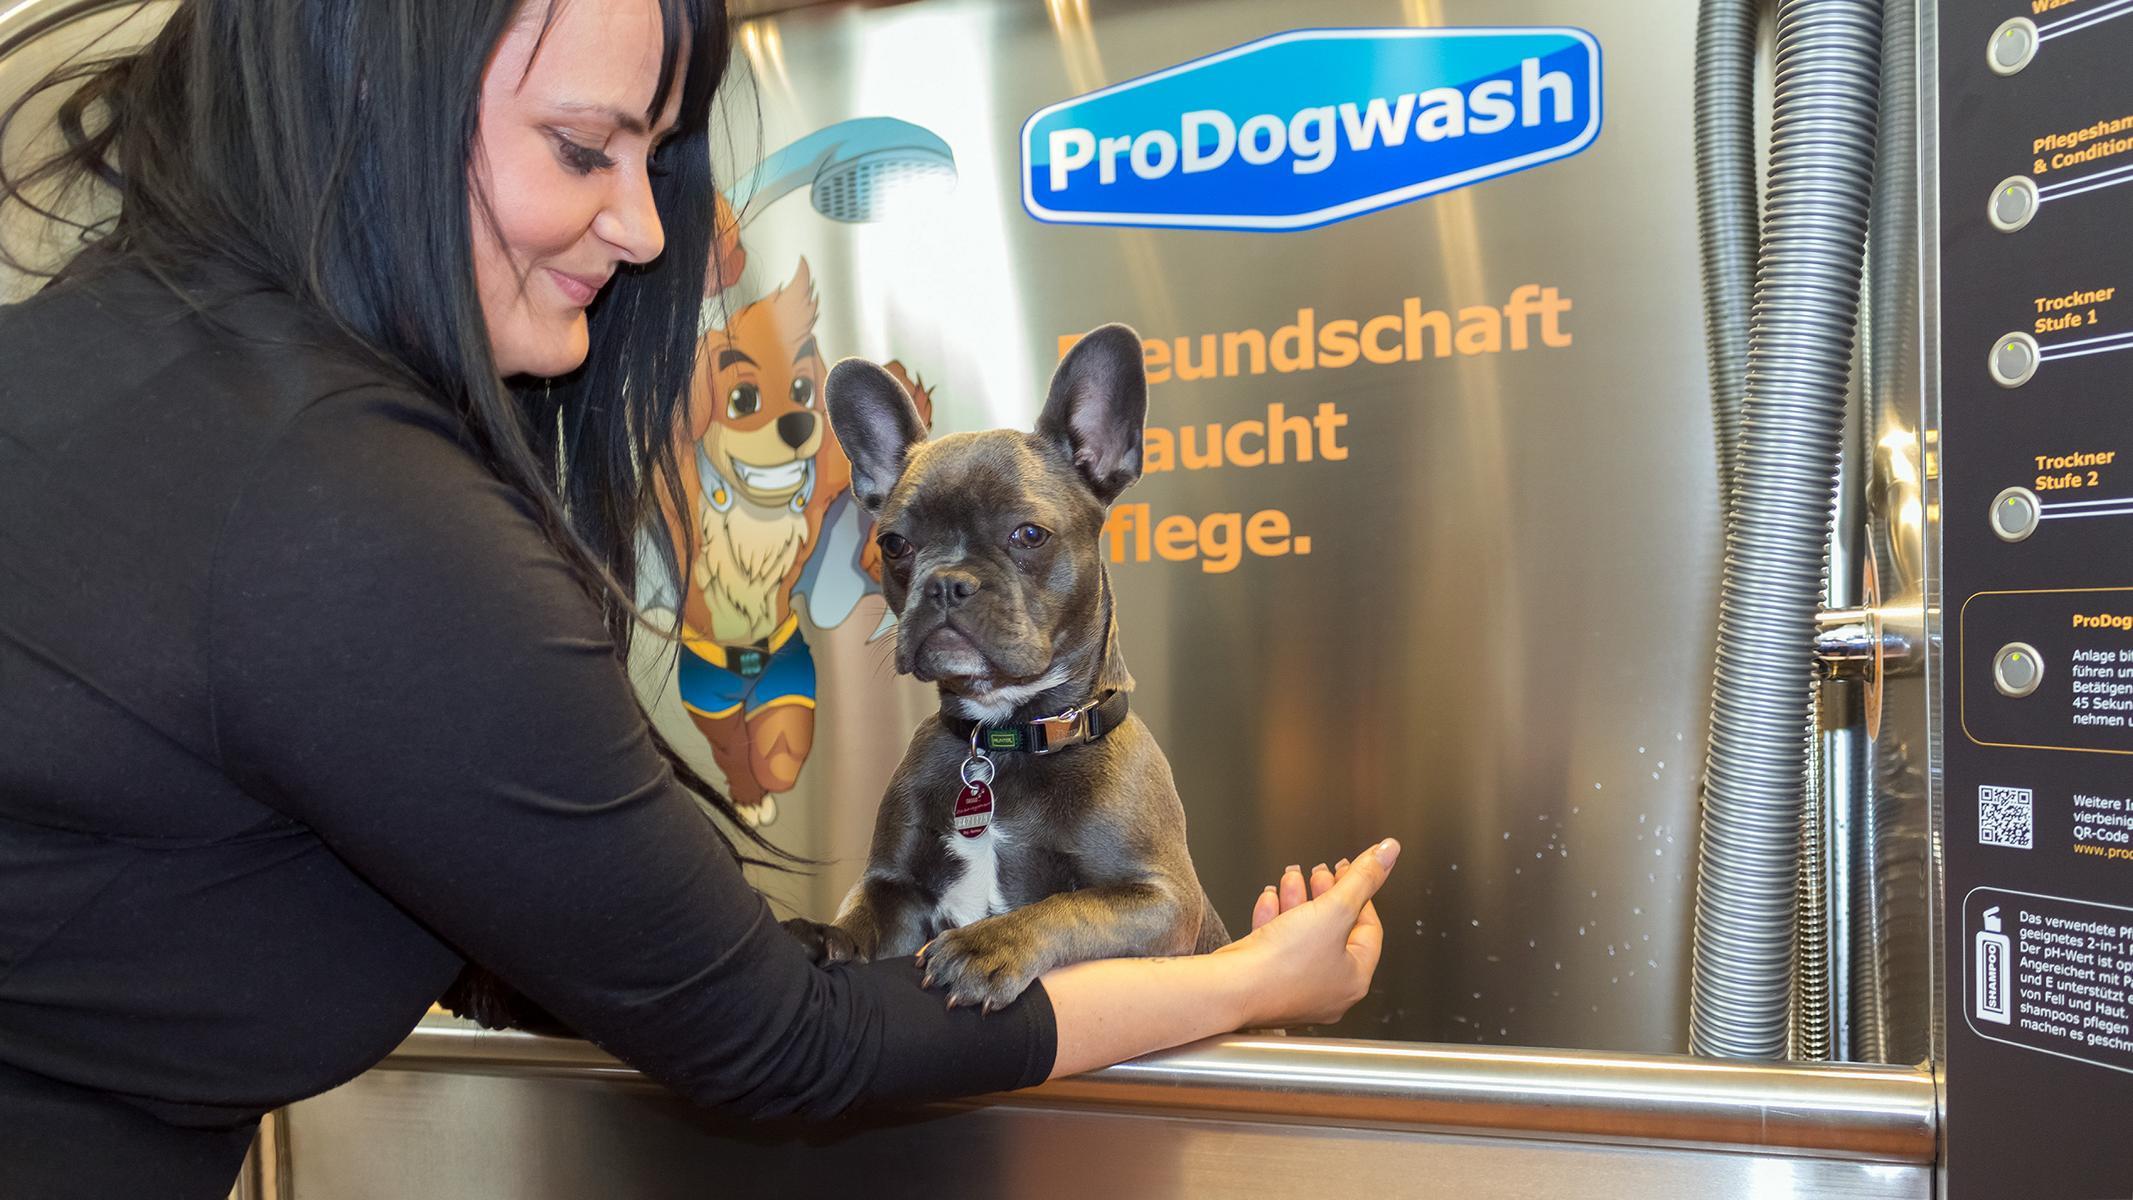 K1600_22-prodogwash-hudnewaschanlage